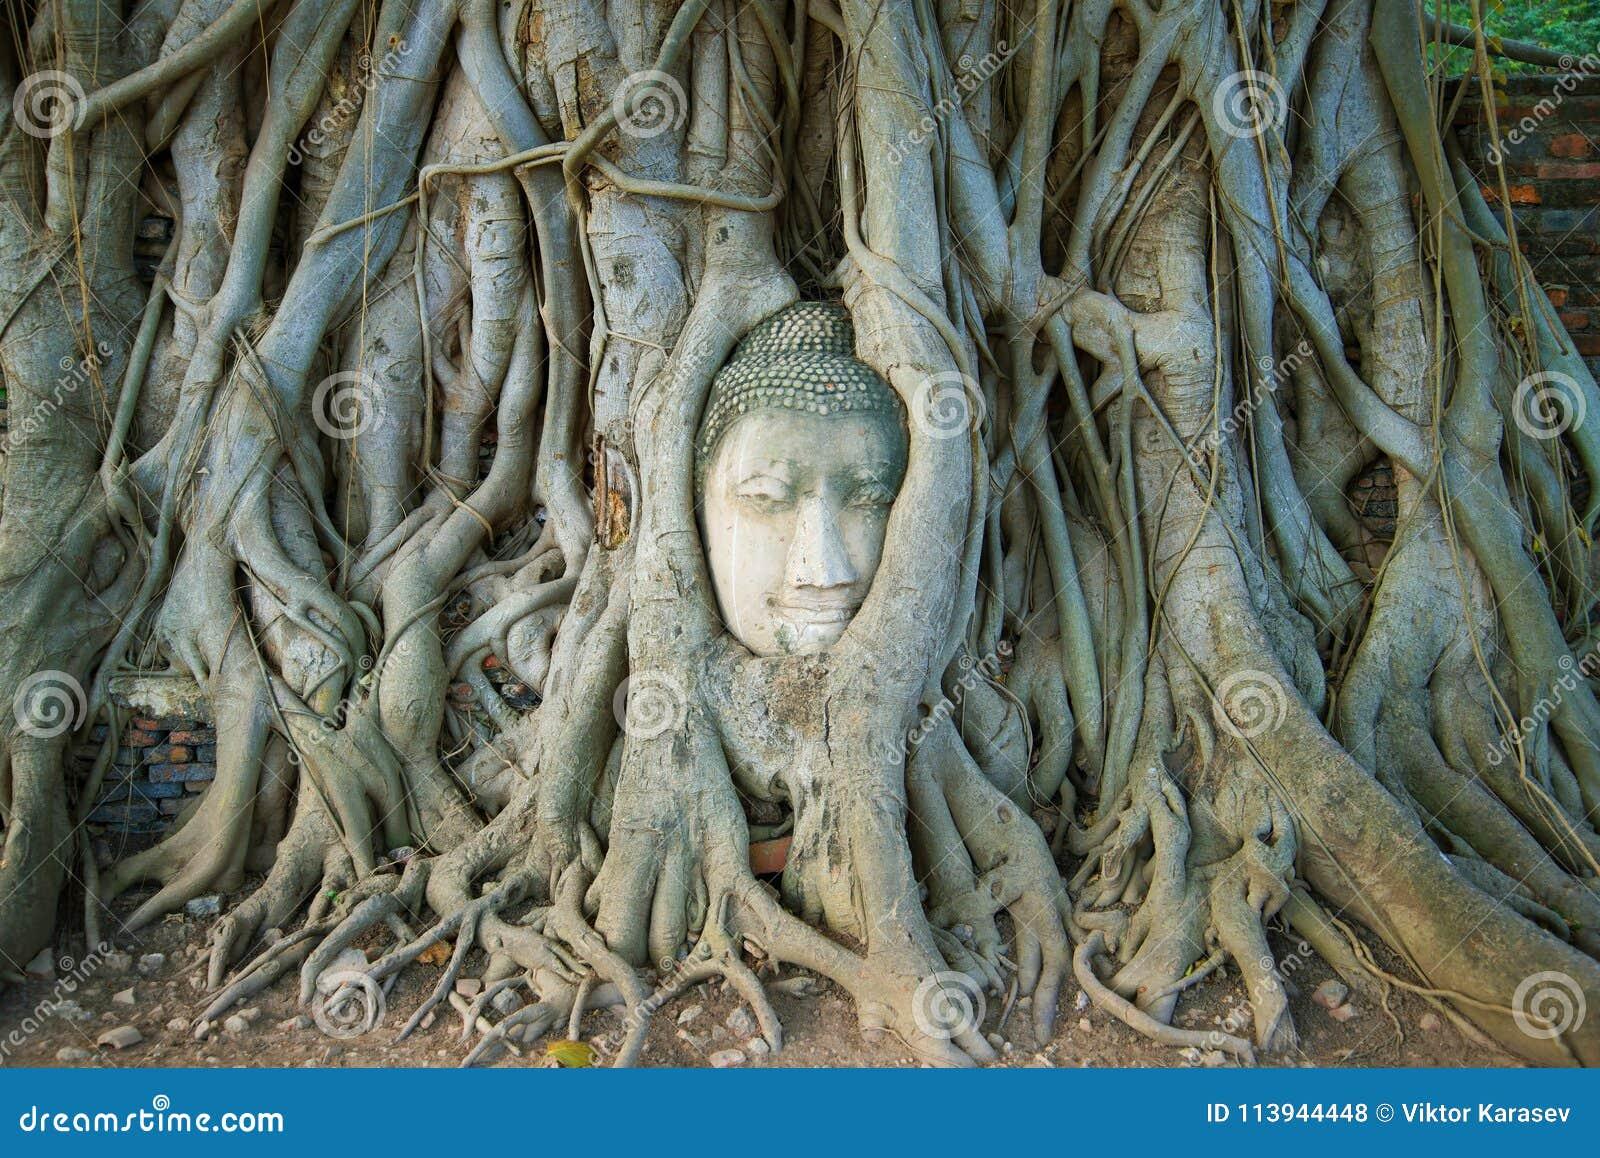 Голова старой скульптуры Будды ingrown в корни дерева Символ города Ayutthaya, Таиланда